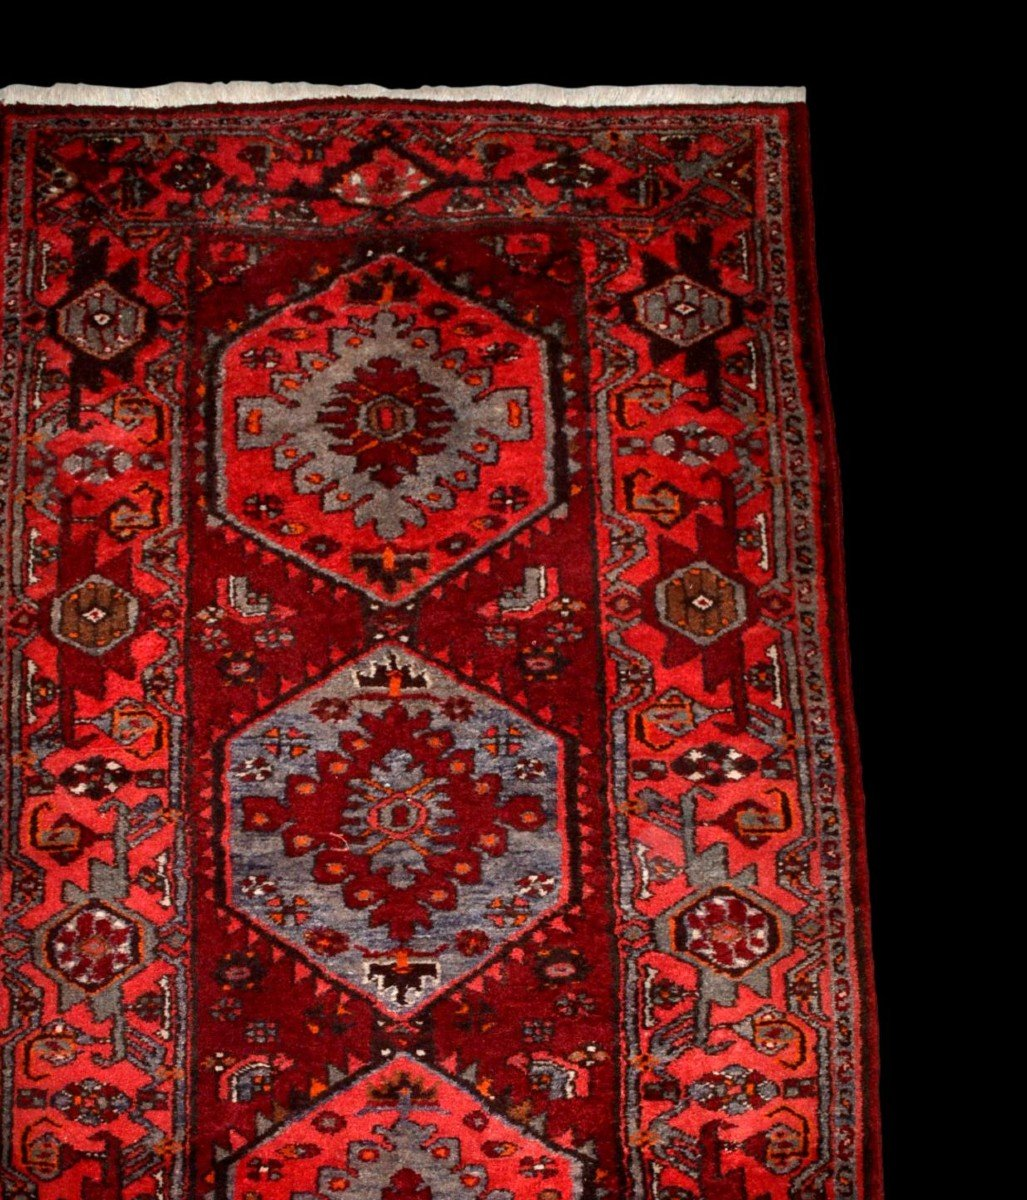 Tapis Persan Hamadan, Iran, 110 cm x 204 cm, laine nouée main vers 1970, parfait état-photo-4